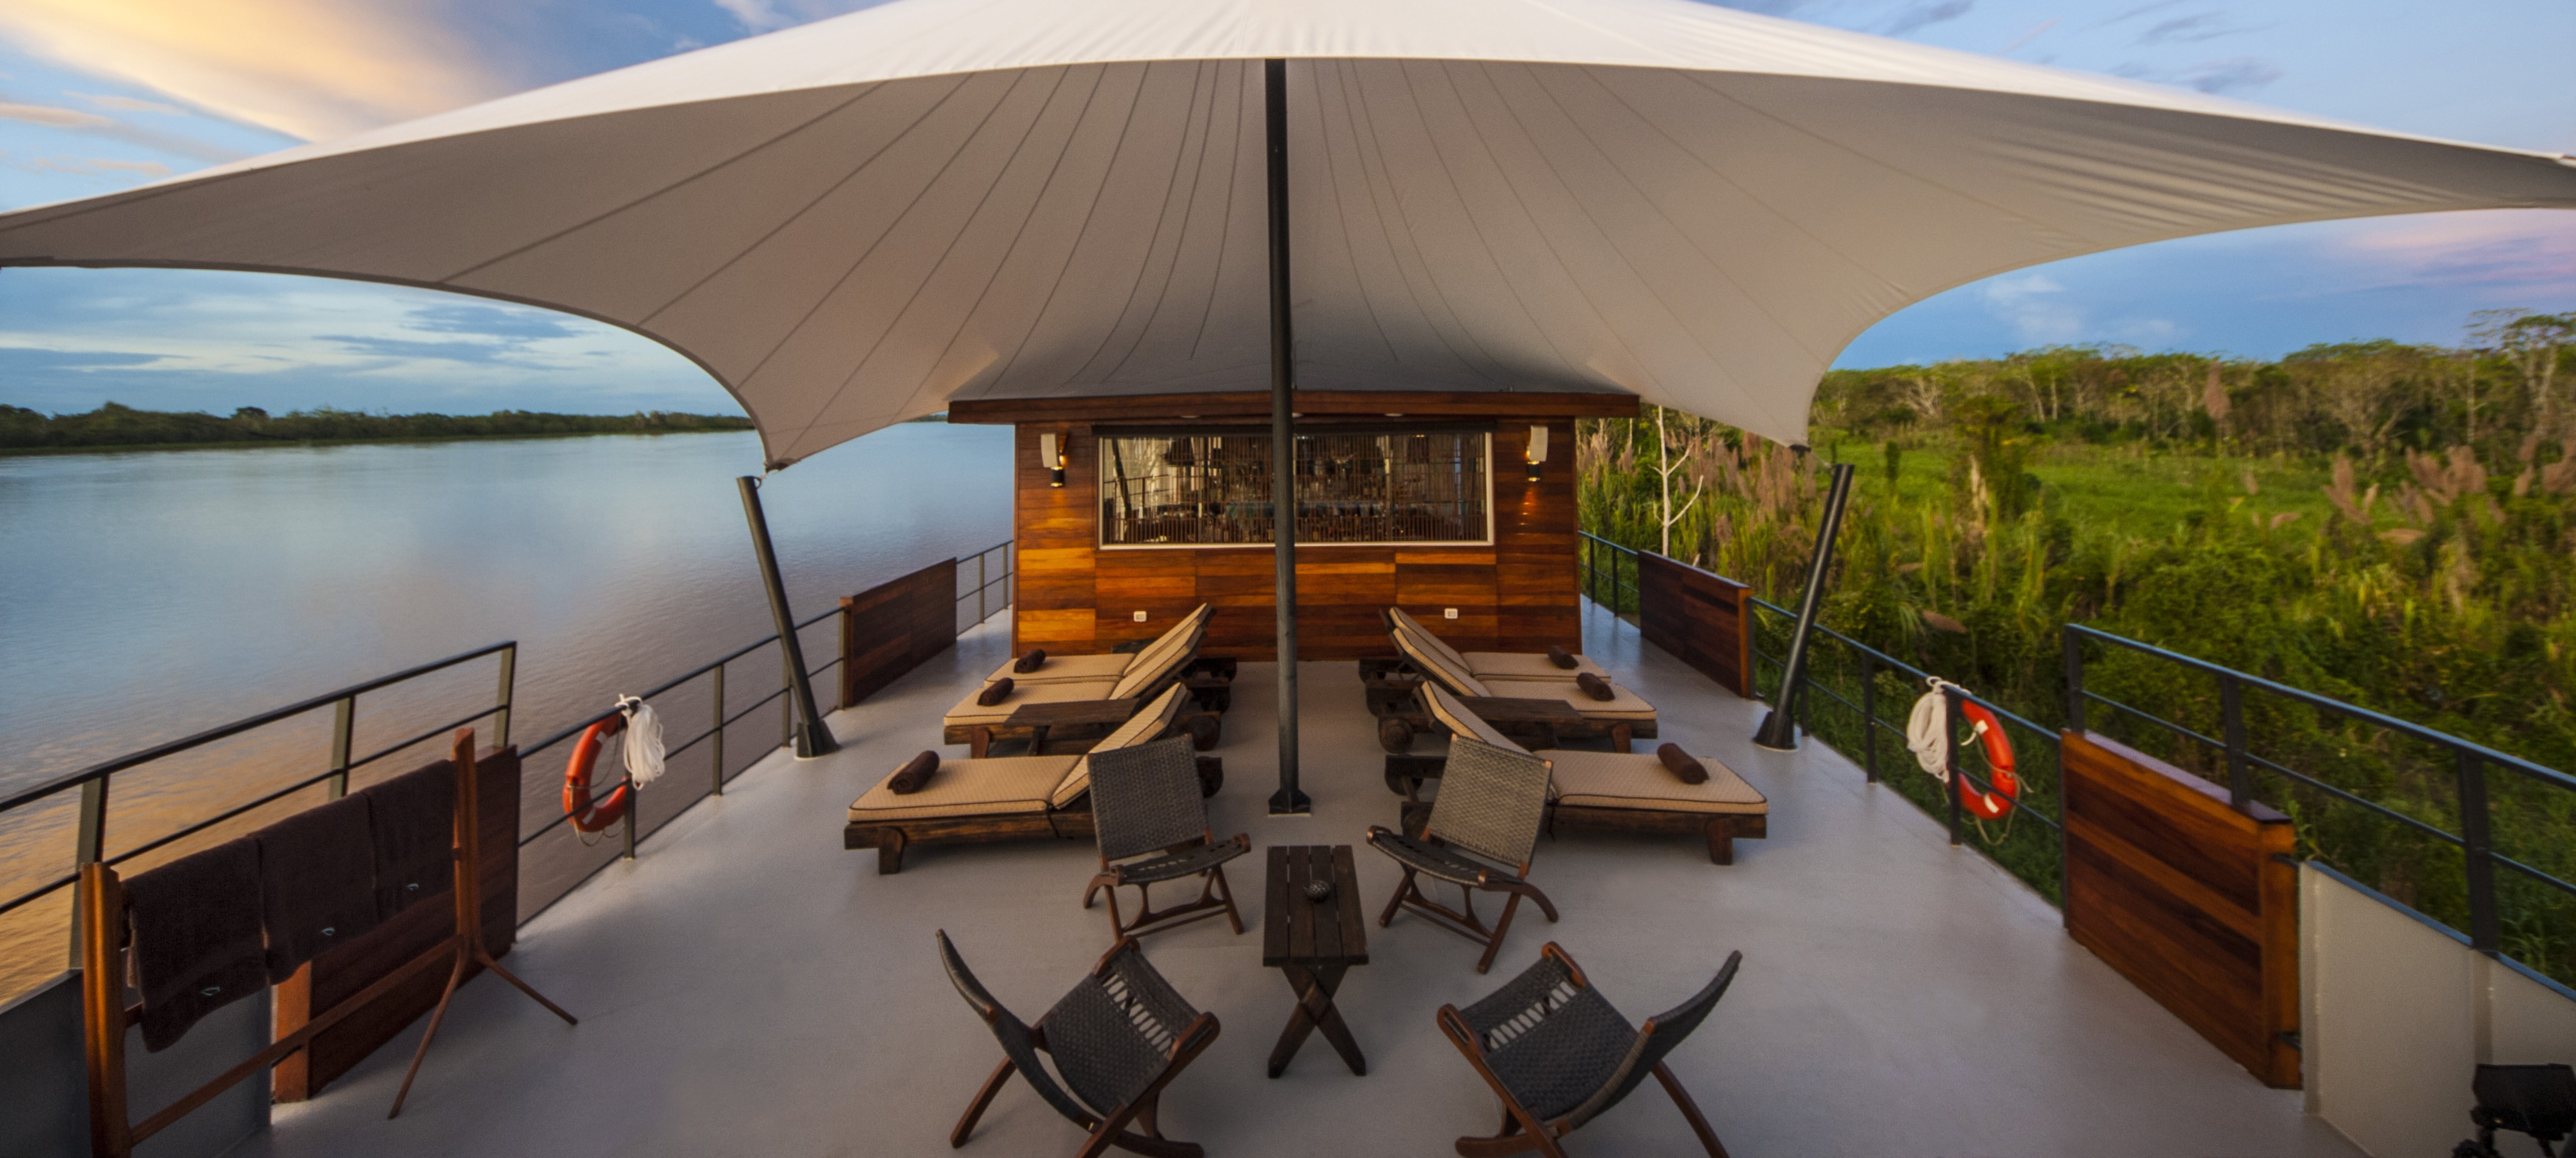 aria-amazon-observation-deck